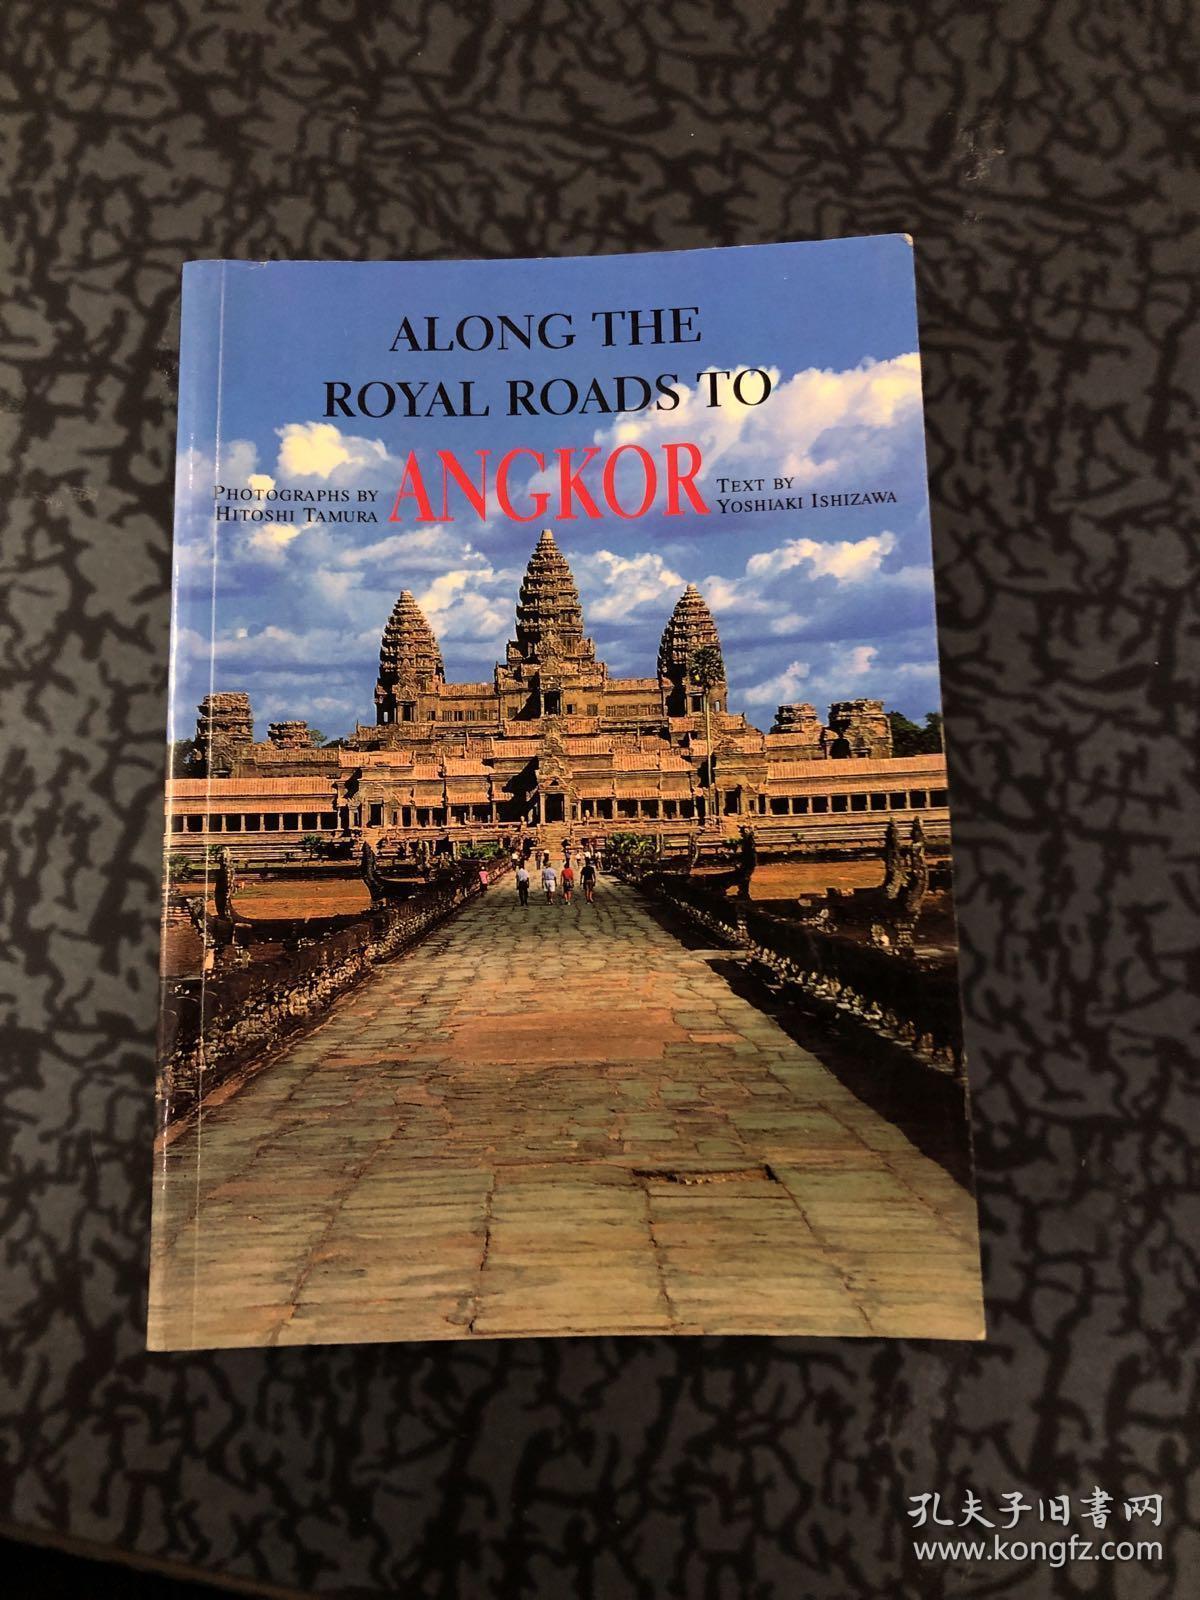 Along The Royal Roads To Angkor /HITOSHI TAMURA WEATHERHILL